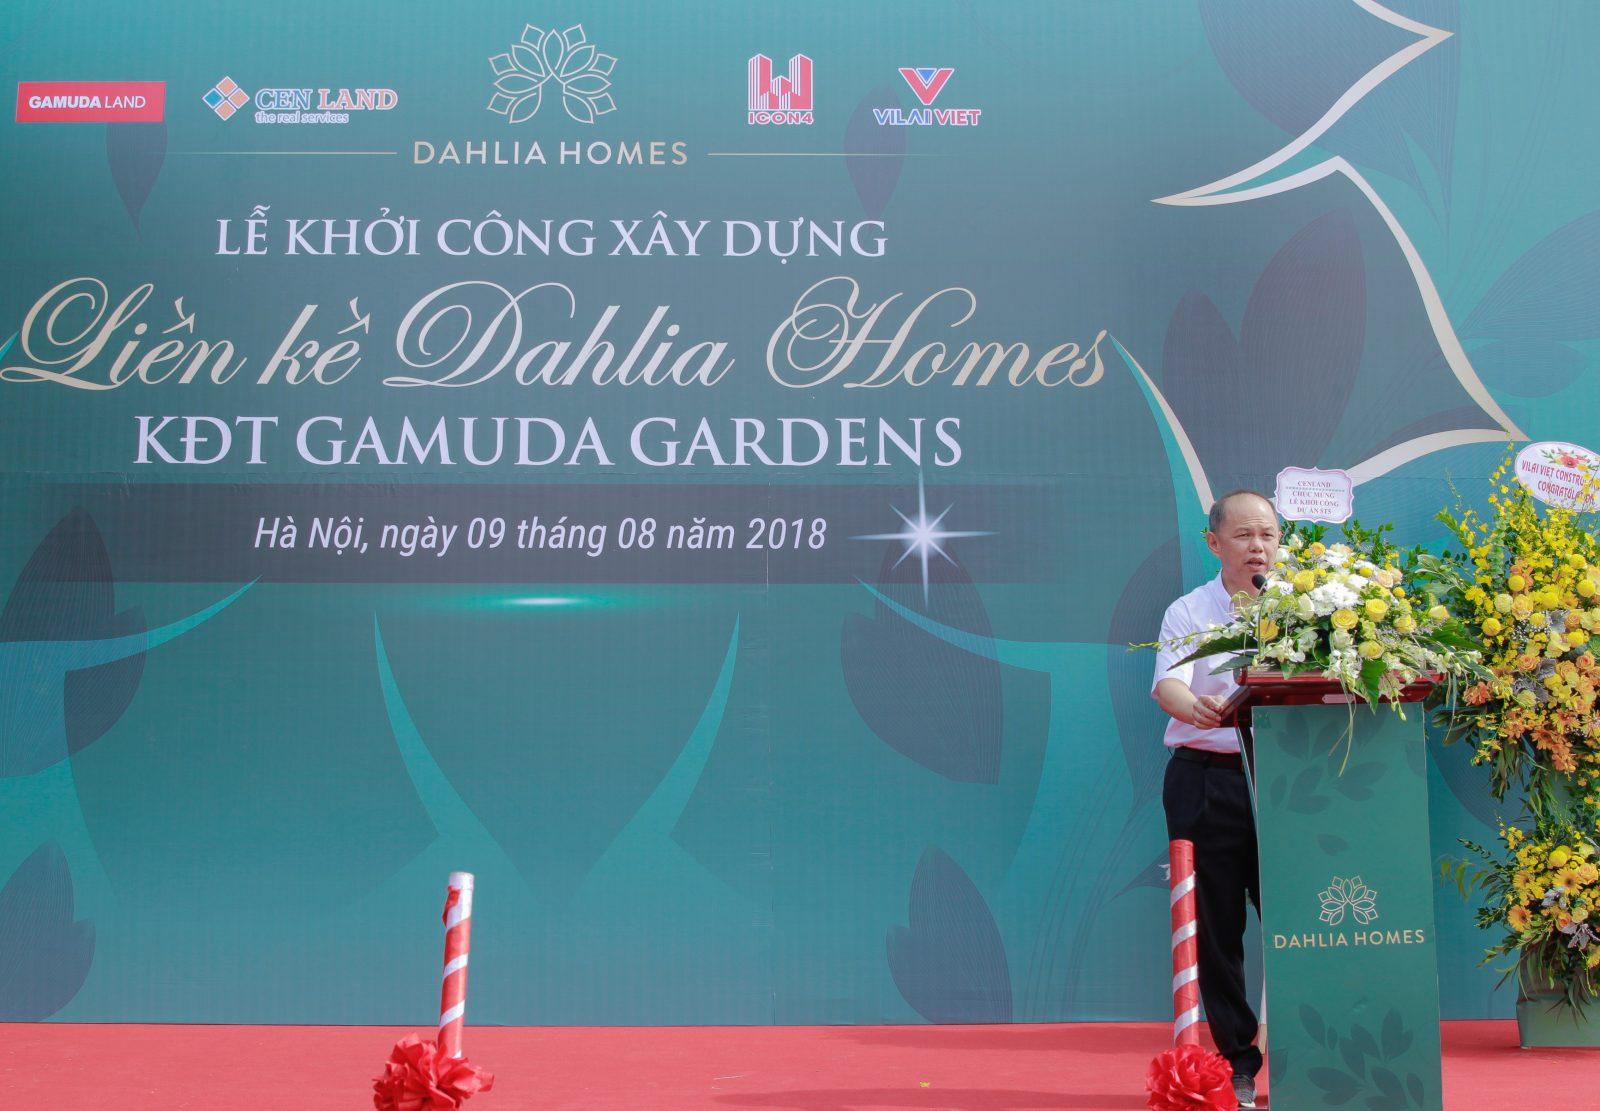 Liền kề Gamuda Gardens ST5